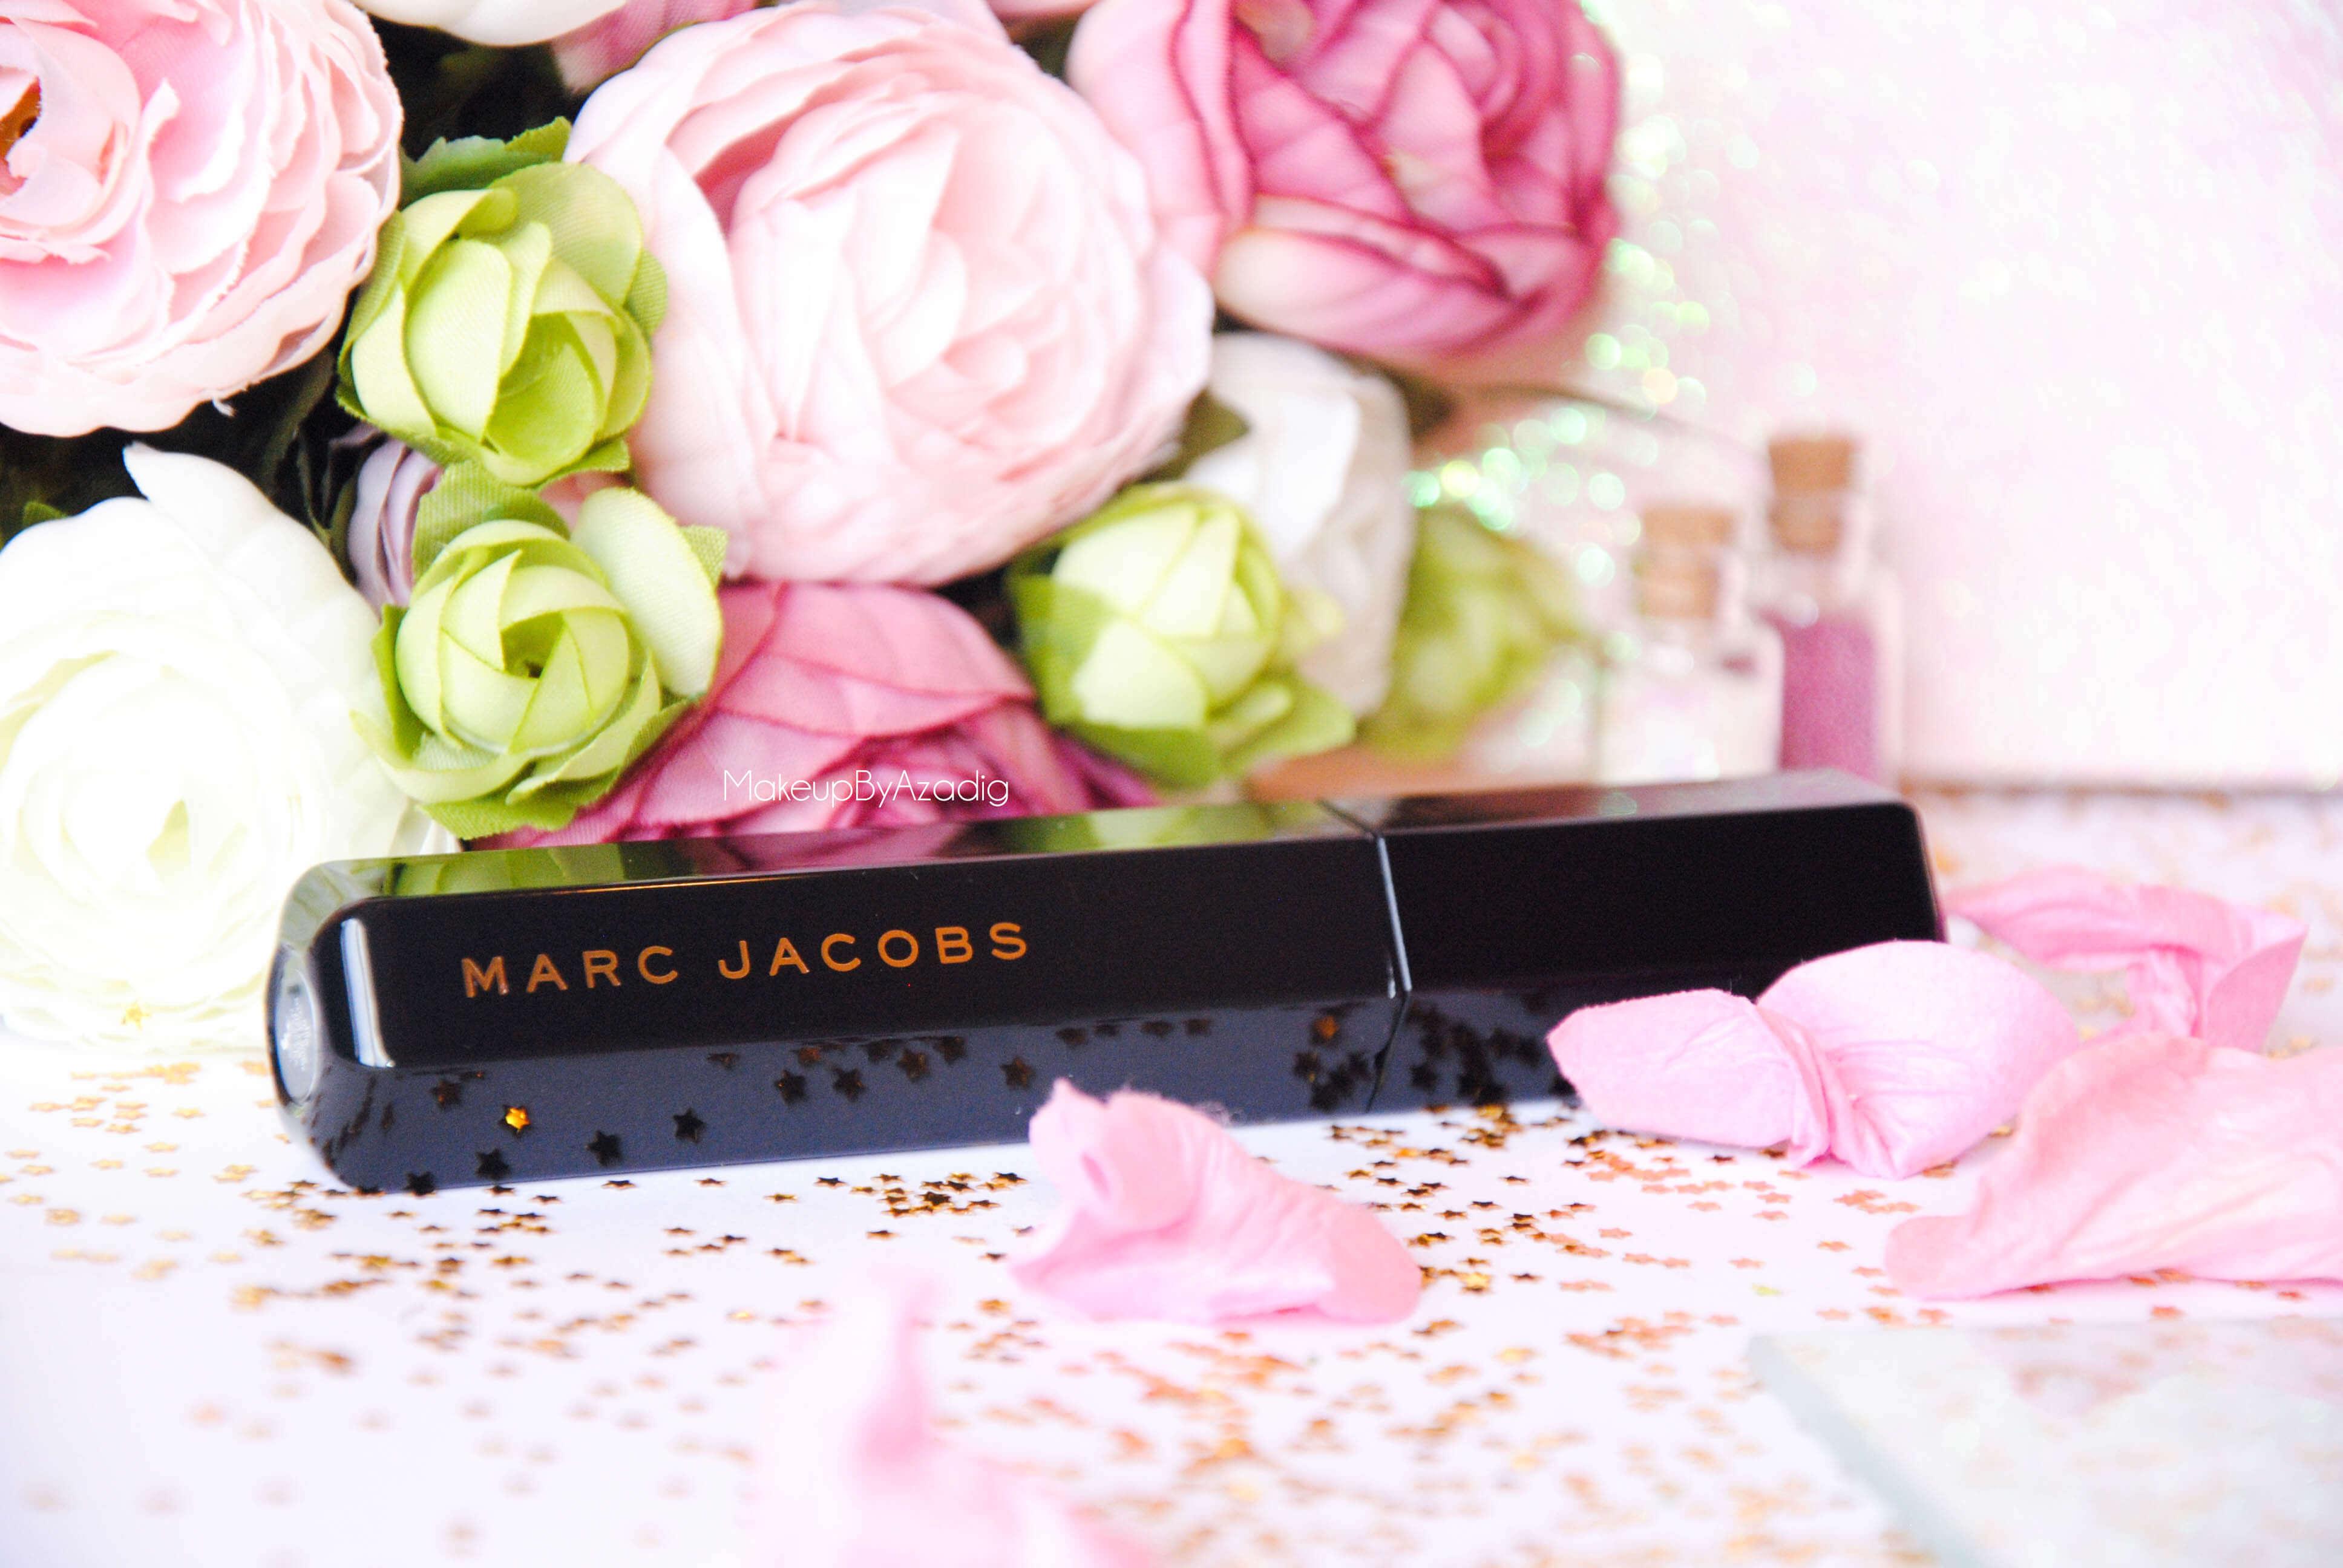 velvet noir-volume spectaculaire-marc jacobs-makeupbyazadig-revue-review-mascara-noir intense-flower